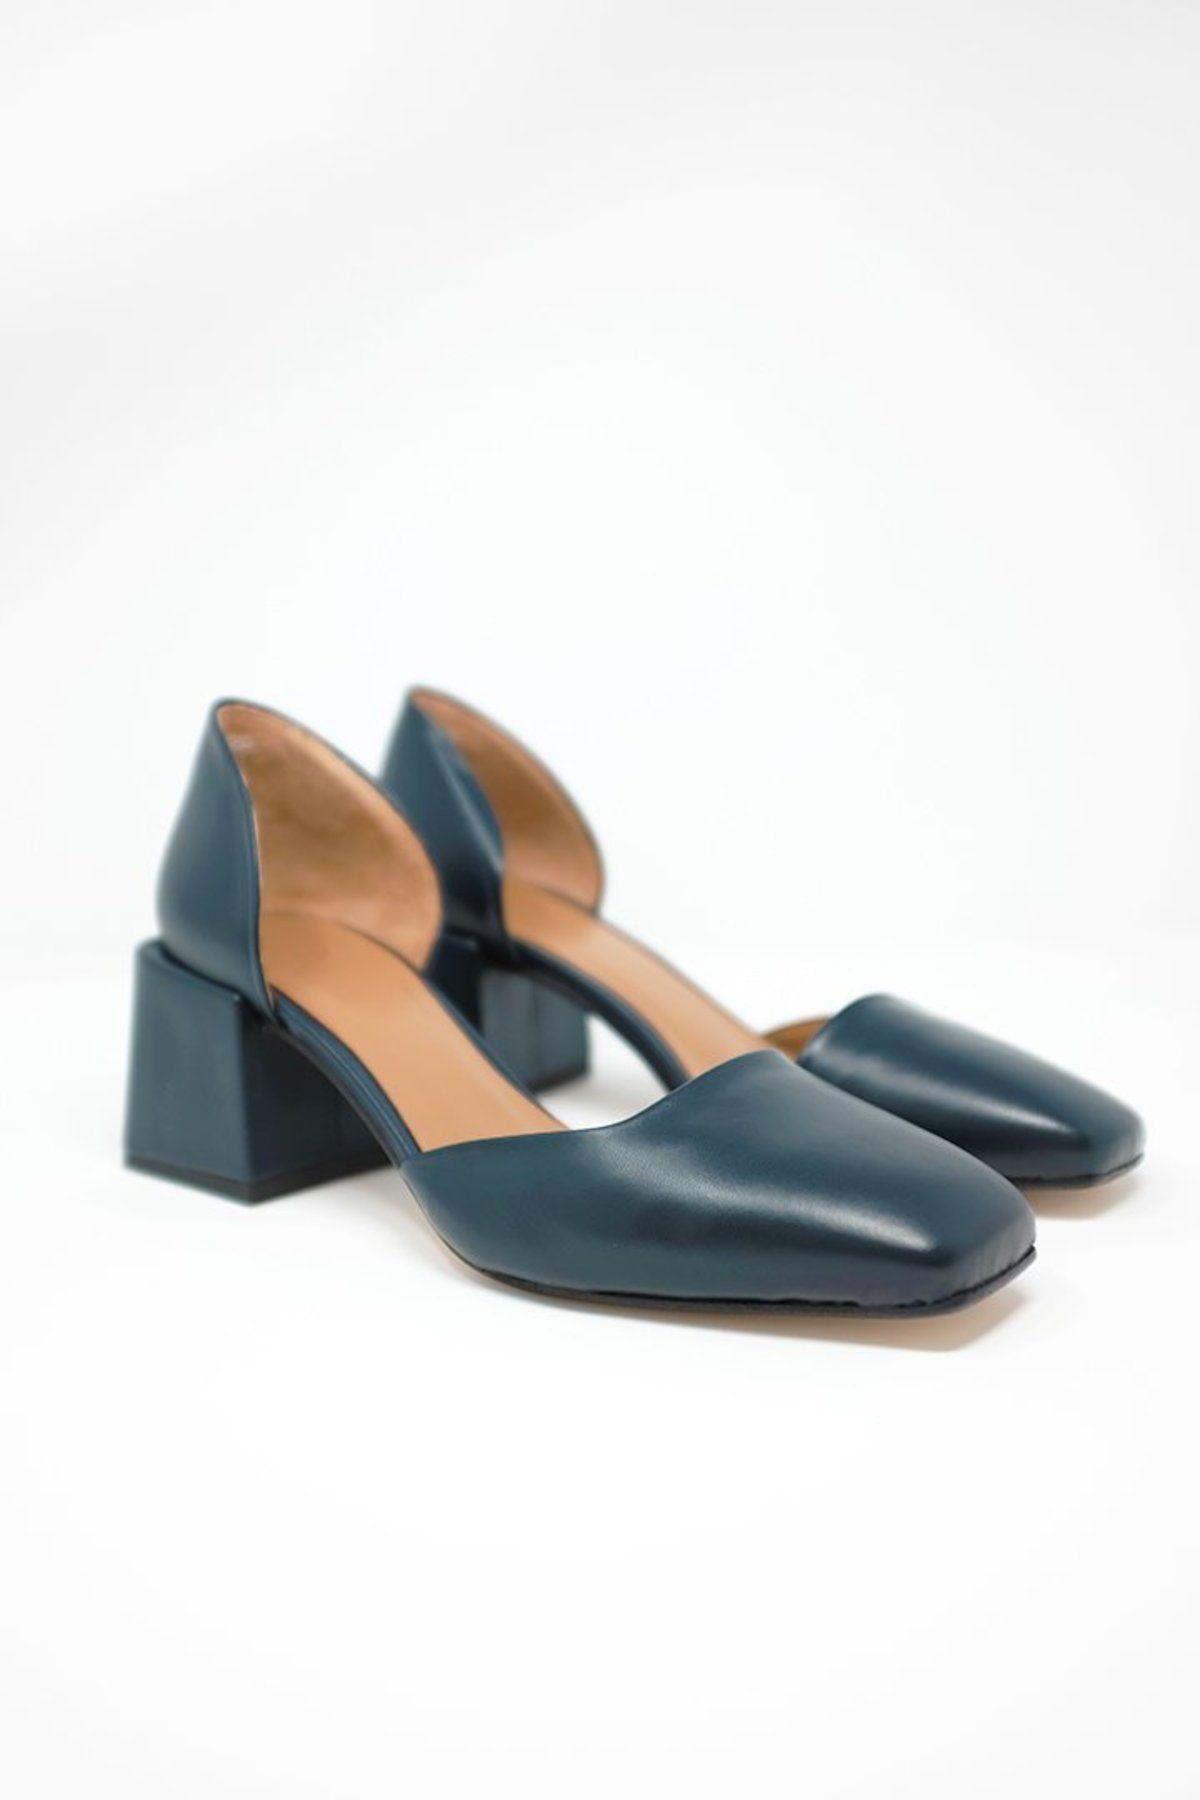 Rich's Vintage Daisy Tan Heels Size 7.5 N